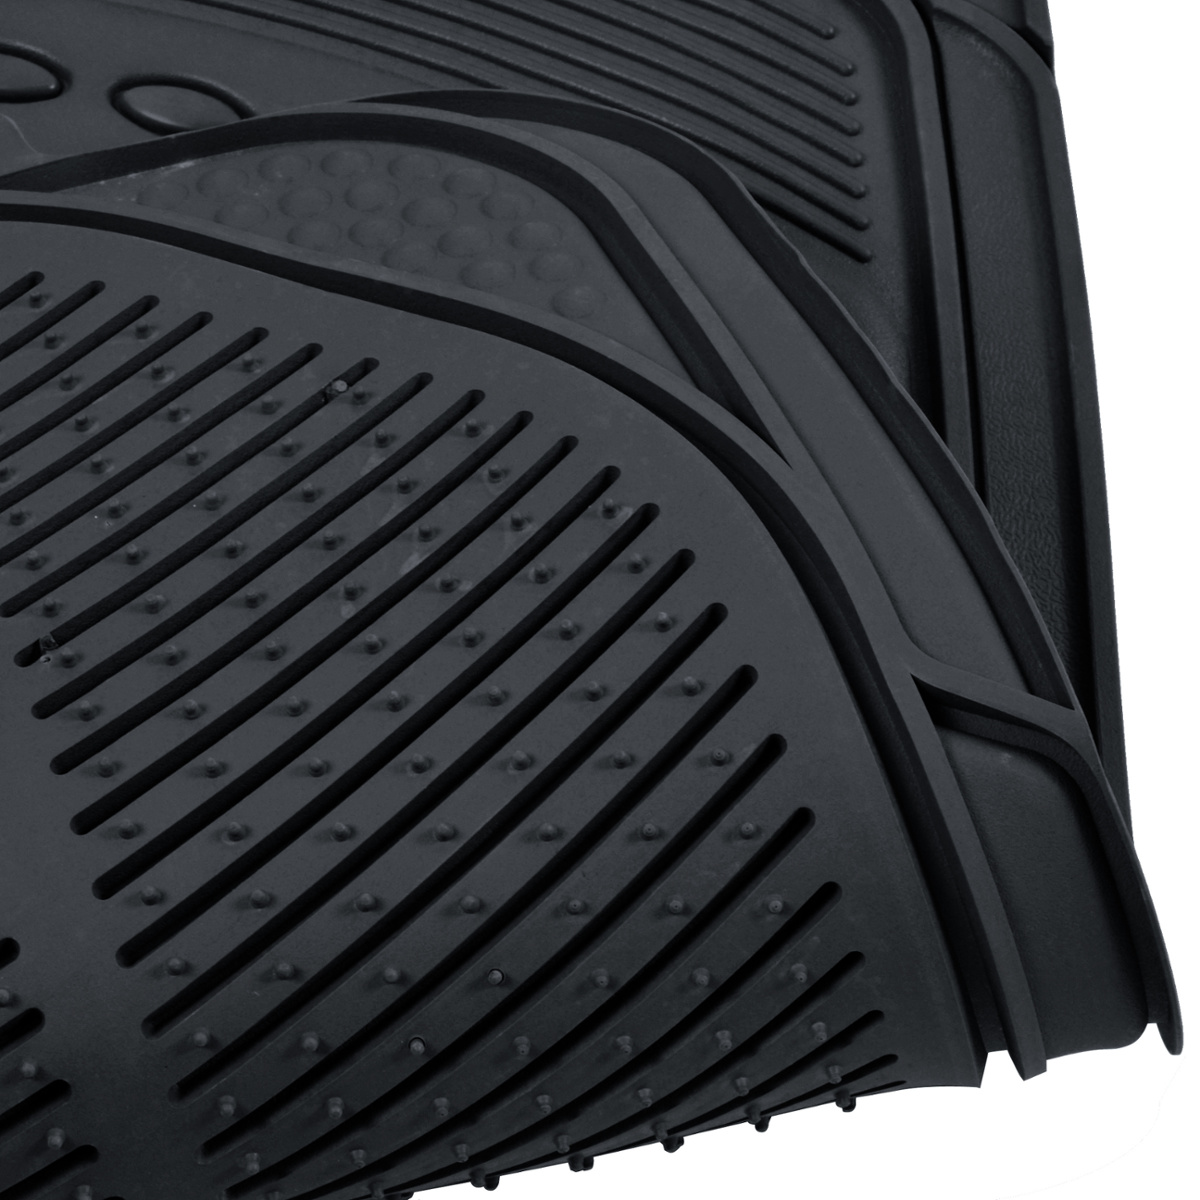 Rubber queen floor mats - Car Rubber Floor Mats Car Suv Truck Black All Weather Heavy Duty Semi